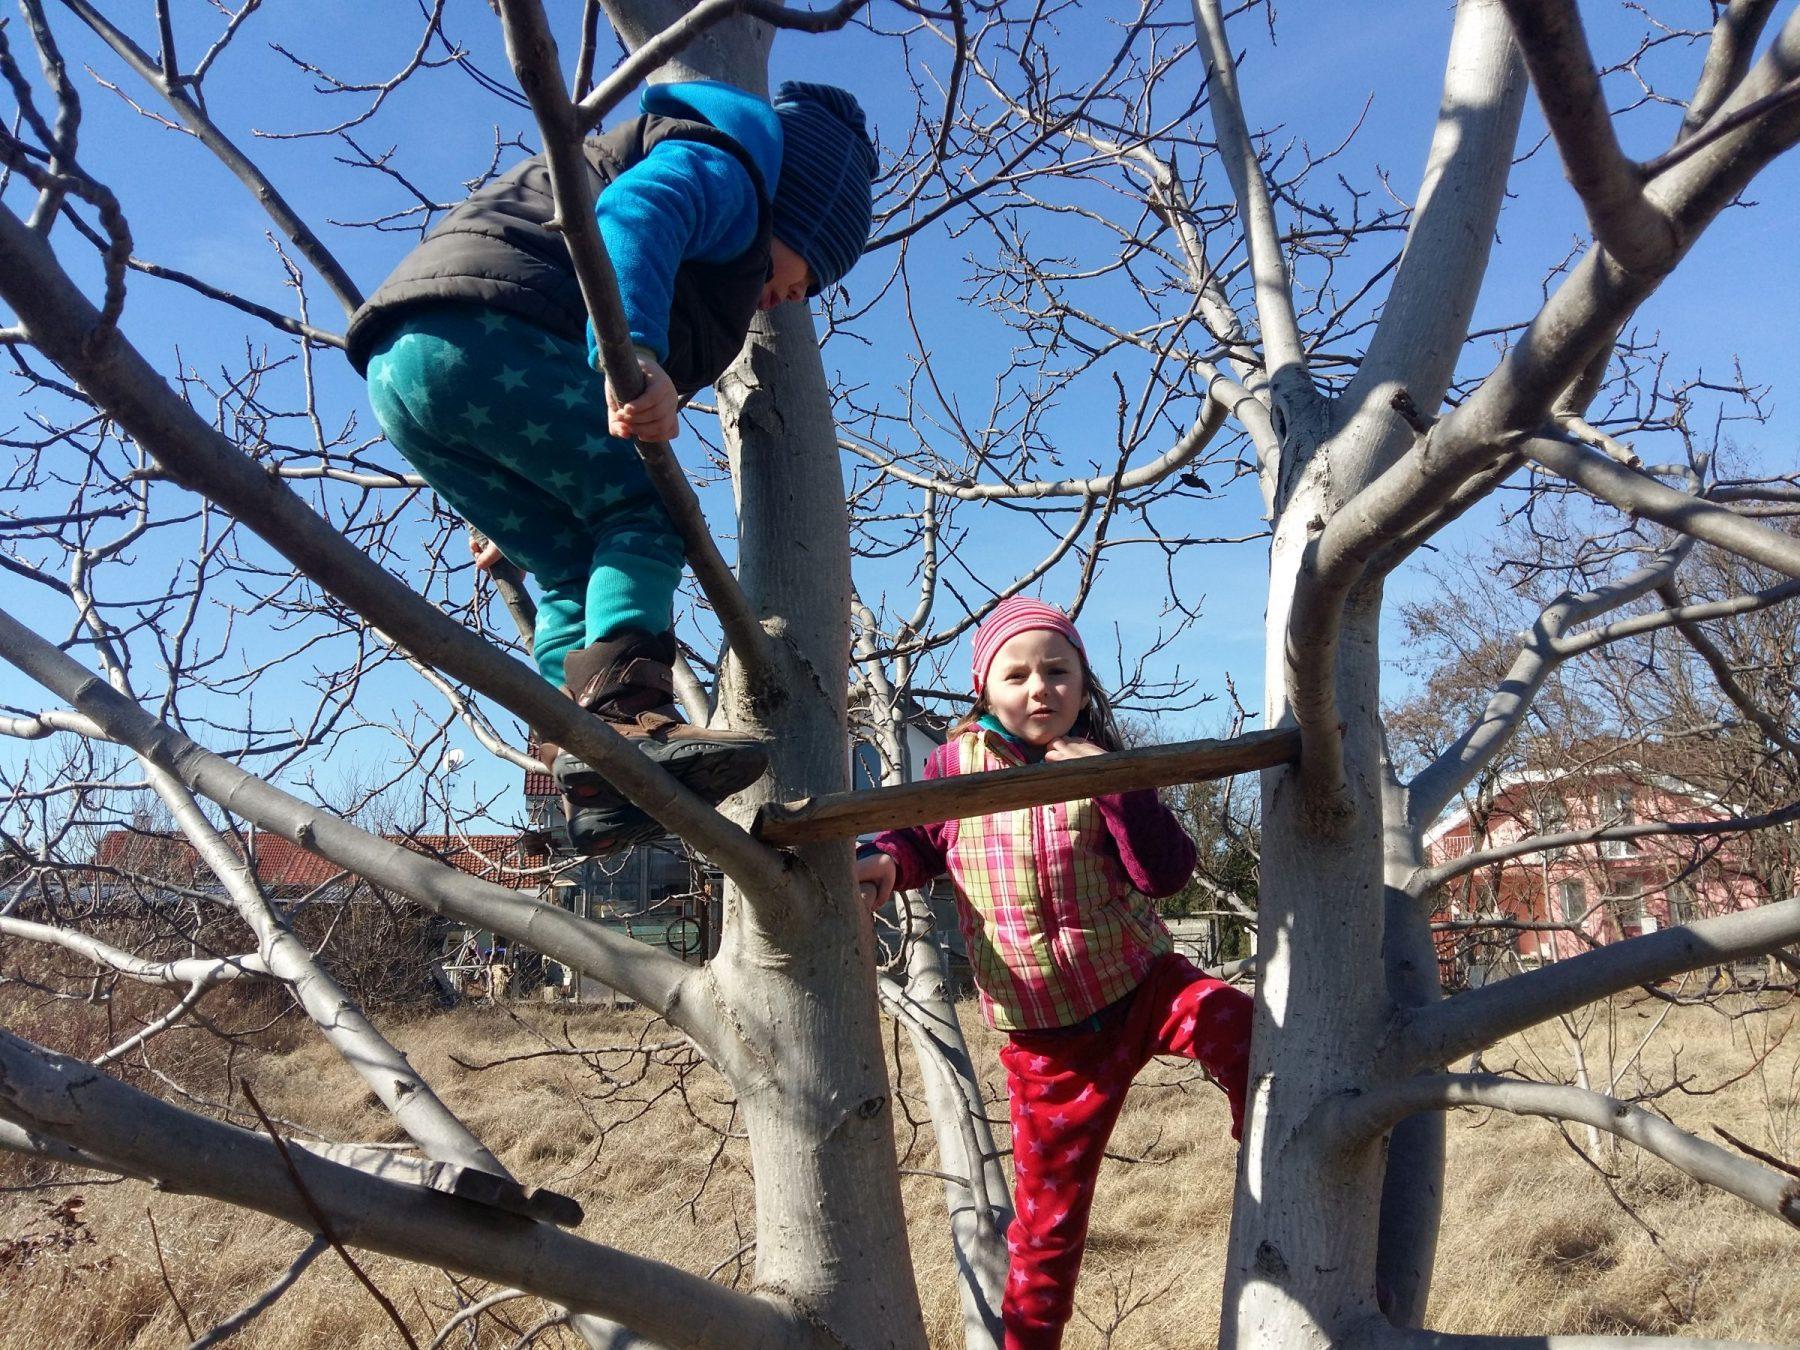 ako sa deti na dedine hrali kedysi